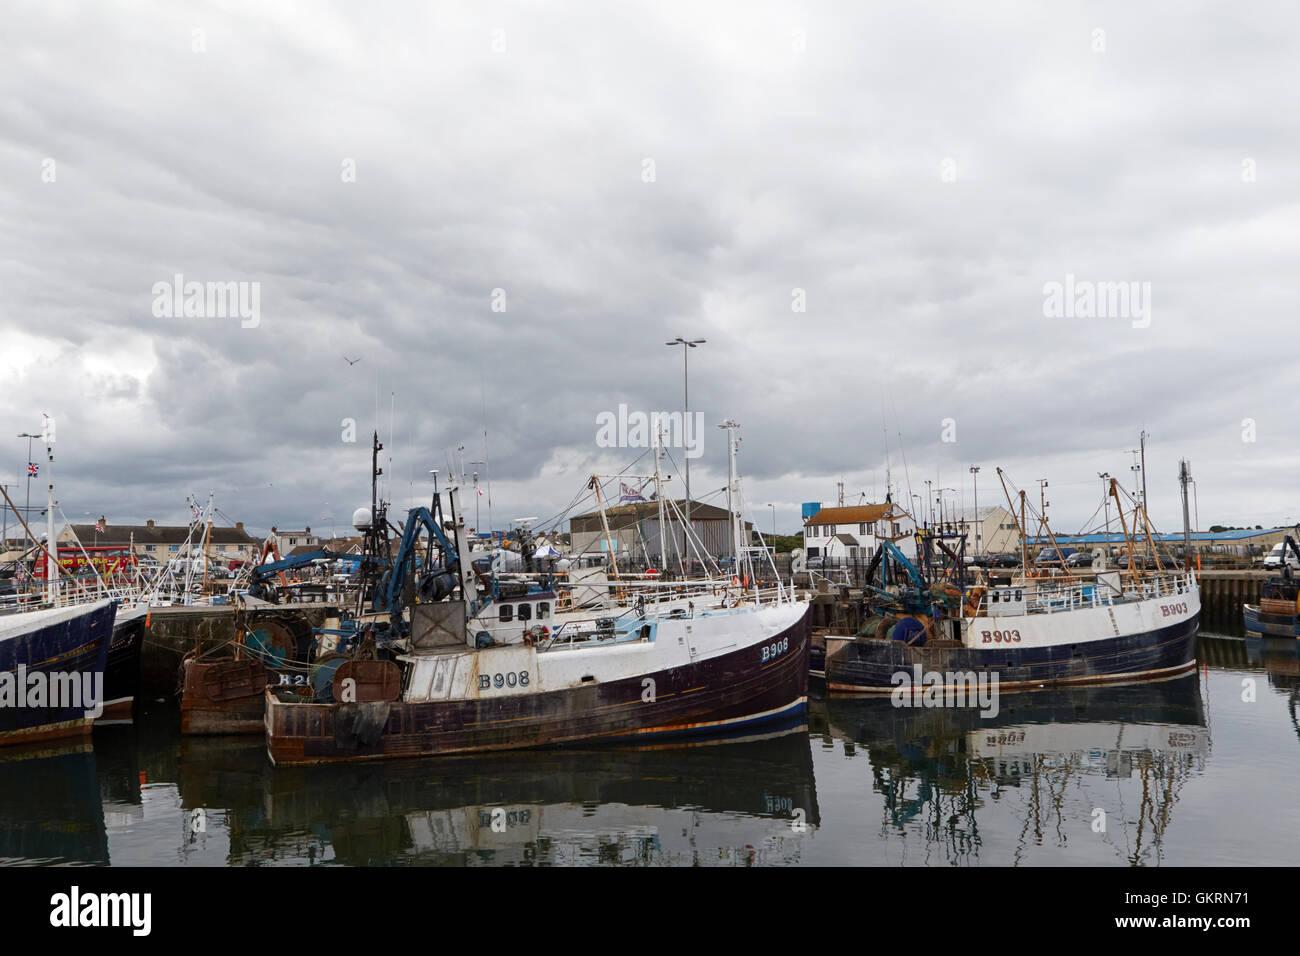 portavogie fishing fleet in harbour under stormy grey skies - Stock Image